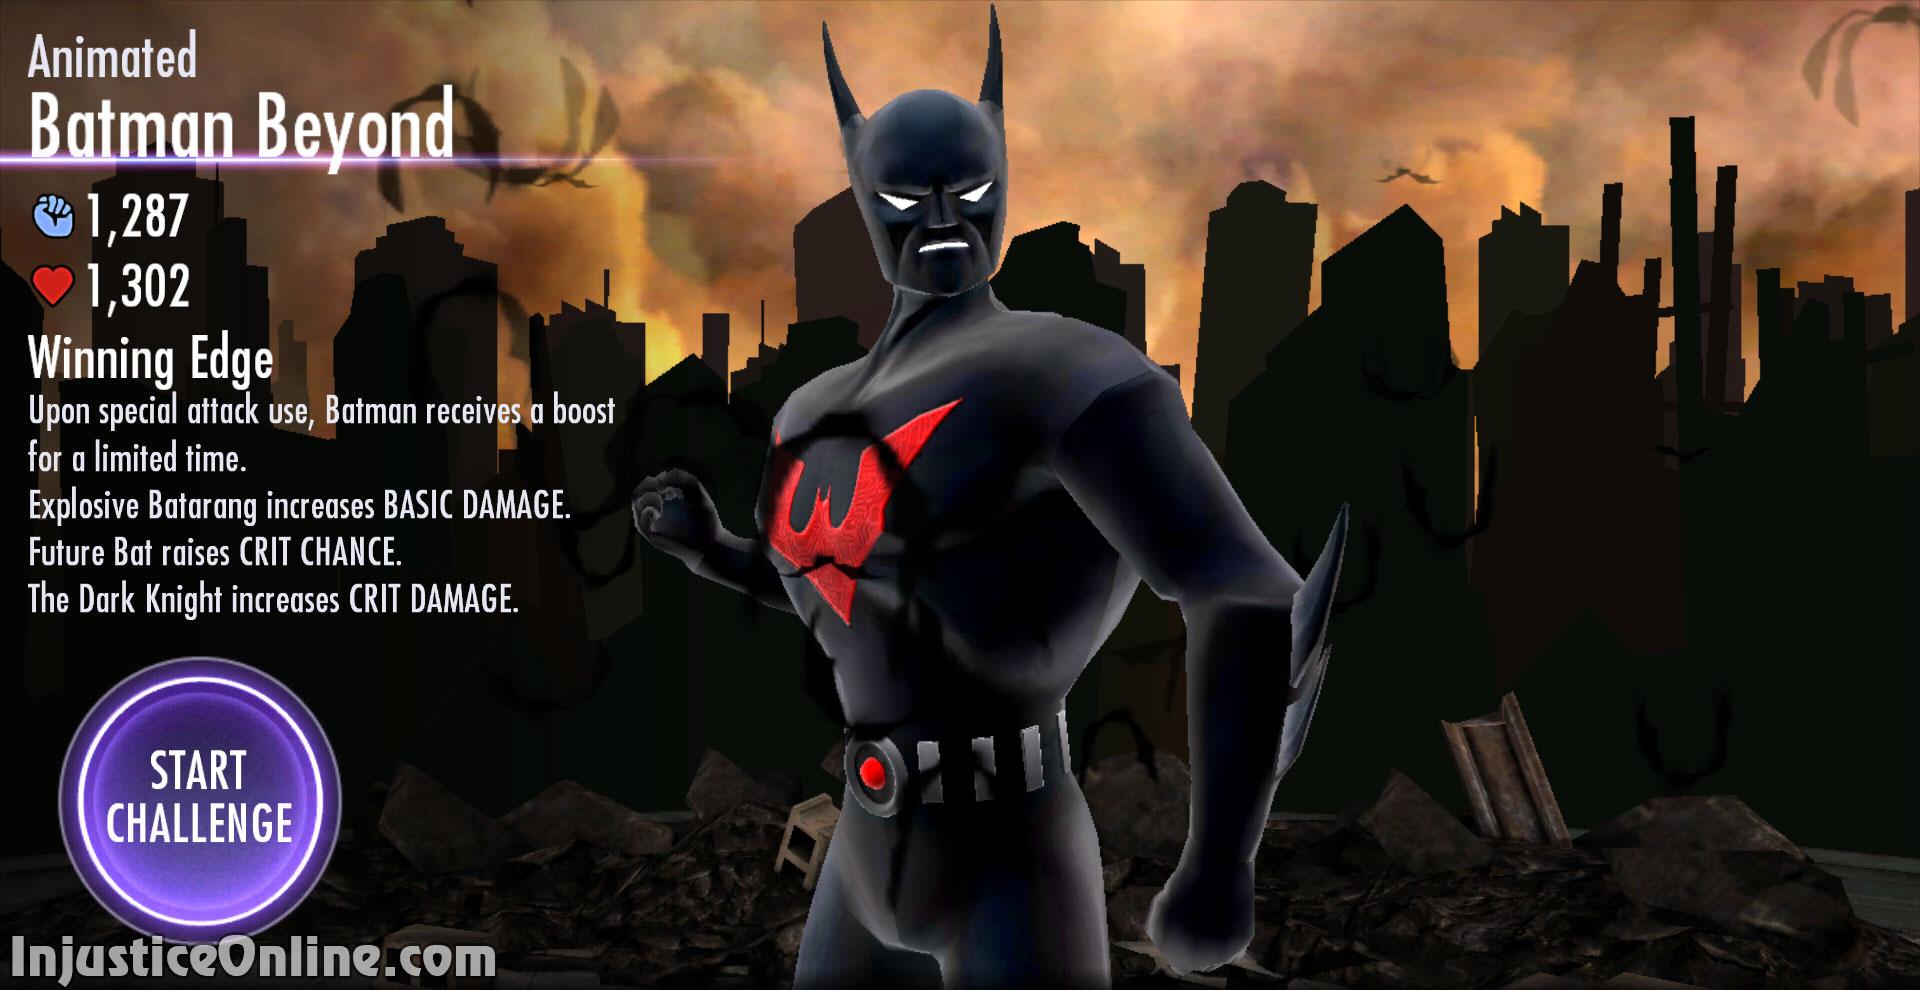 injustice-gods-among-us-mobile-animated-batman-beyond ...